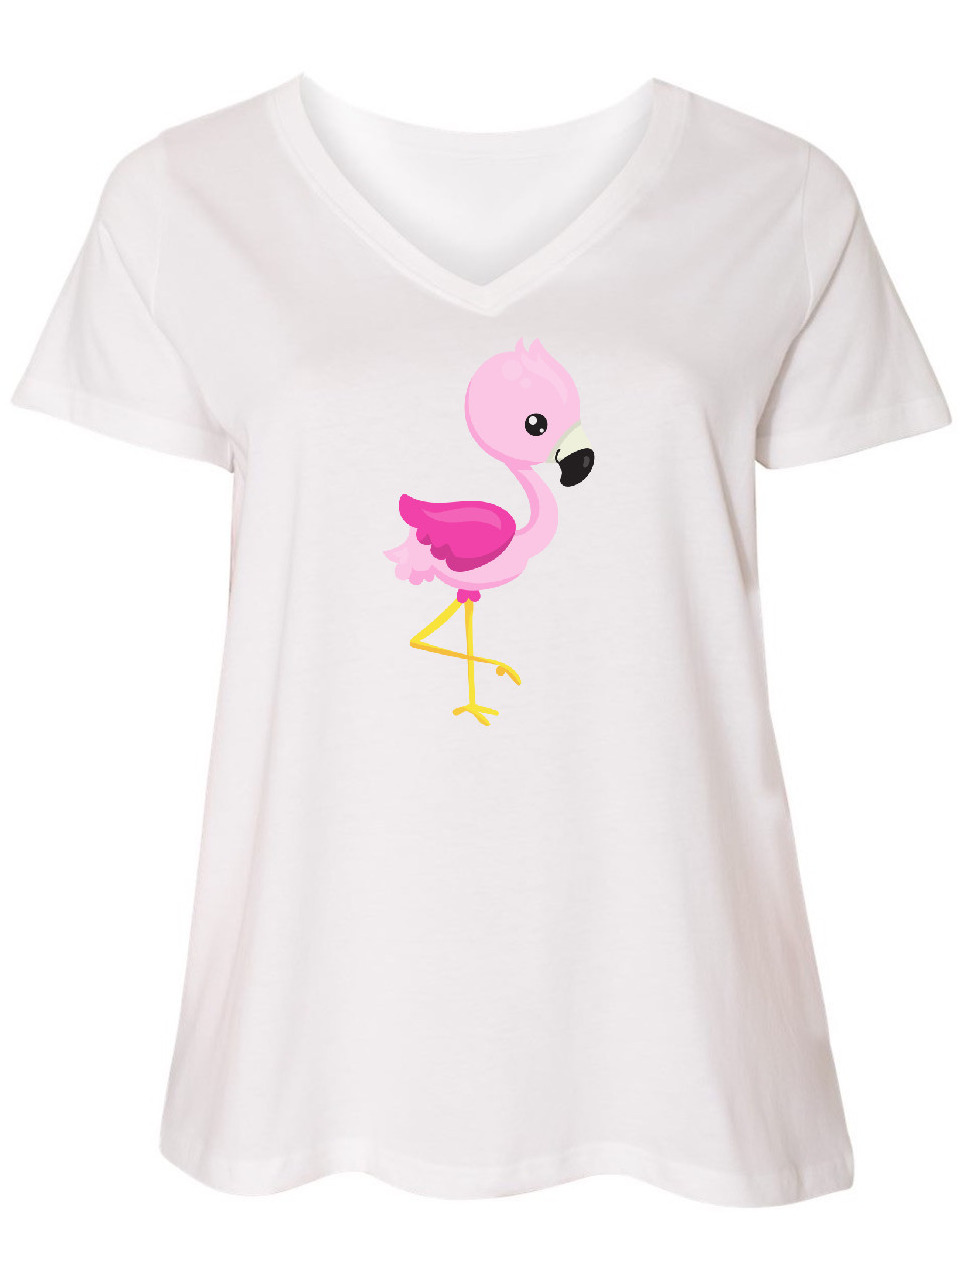 Baby Flamingo Cute Flamingo Baby T-Shirt inktastic Pink Flamingo